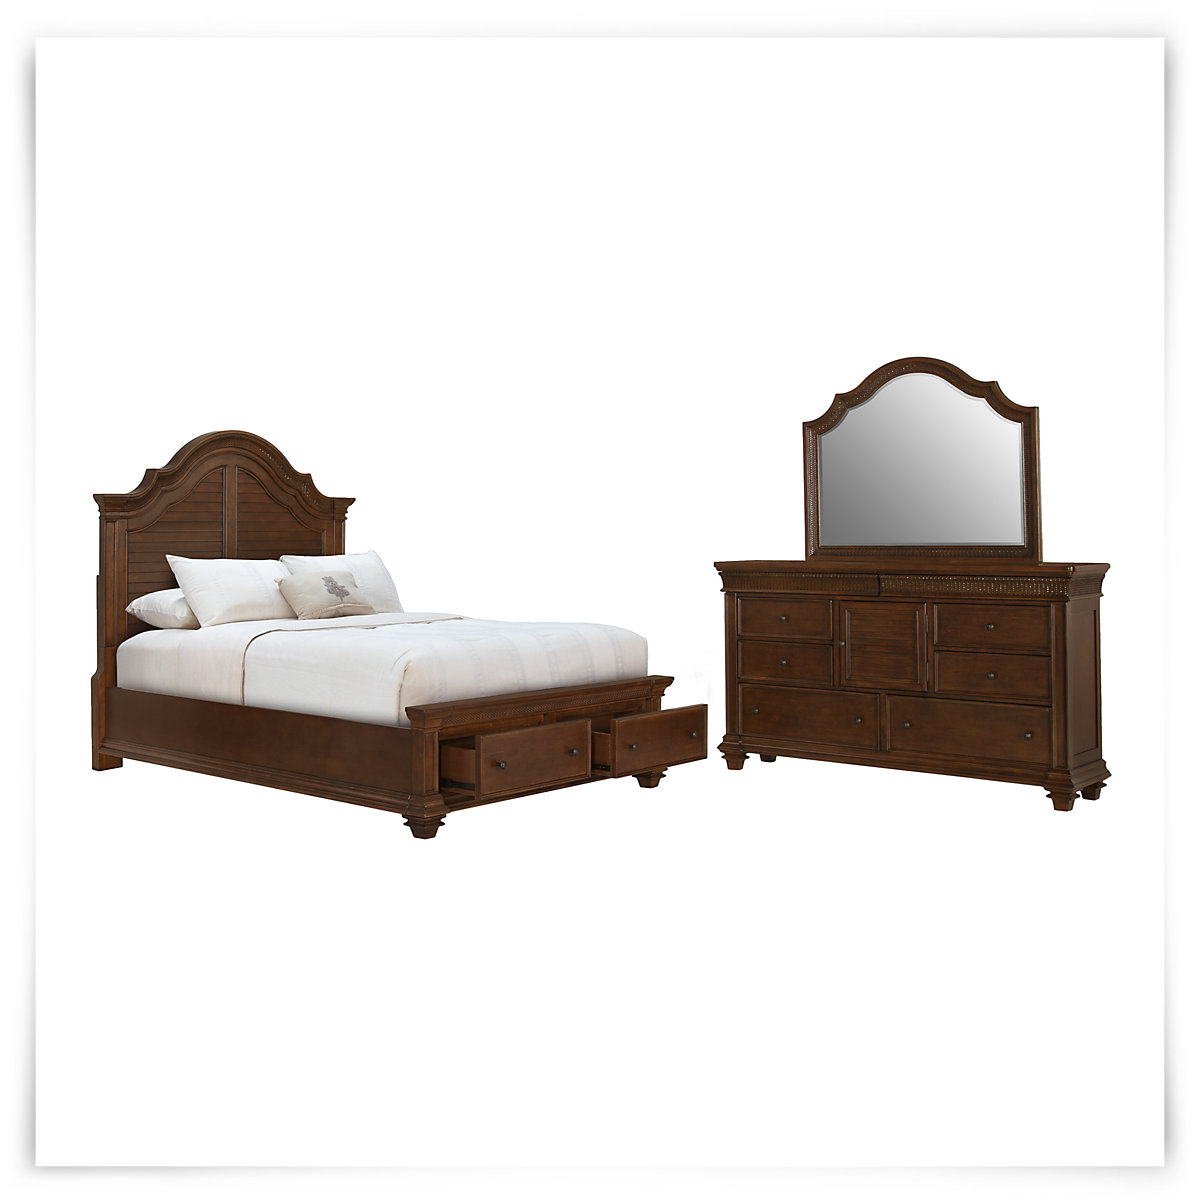 City furniture antigua mid tone panel storage bedroom for Antigua wicker chaise